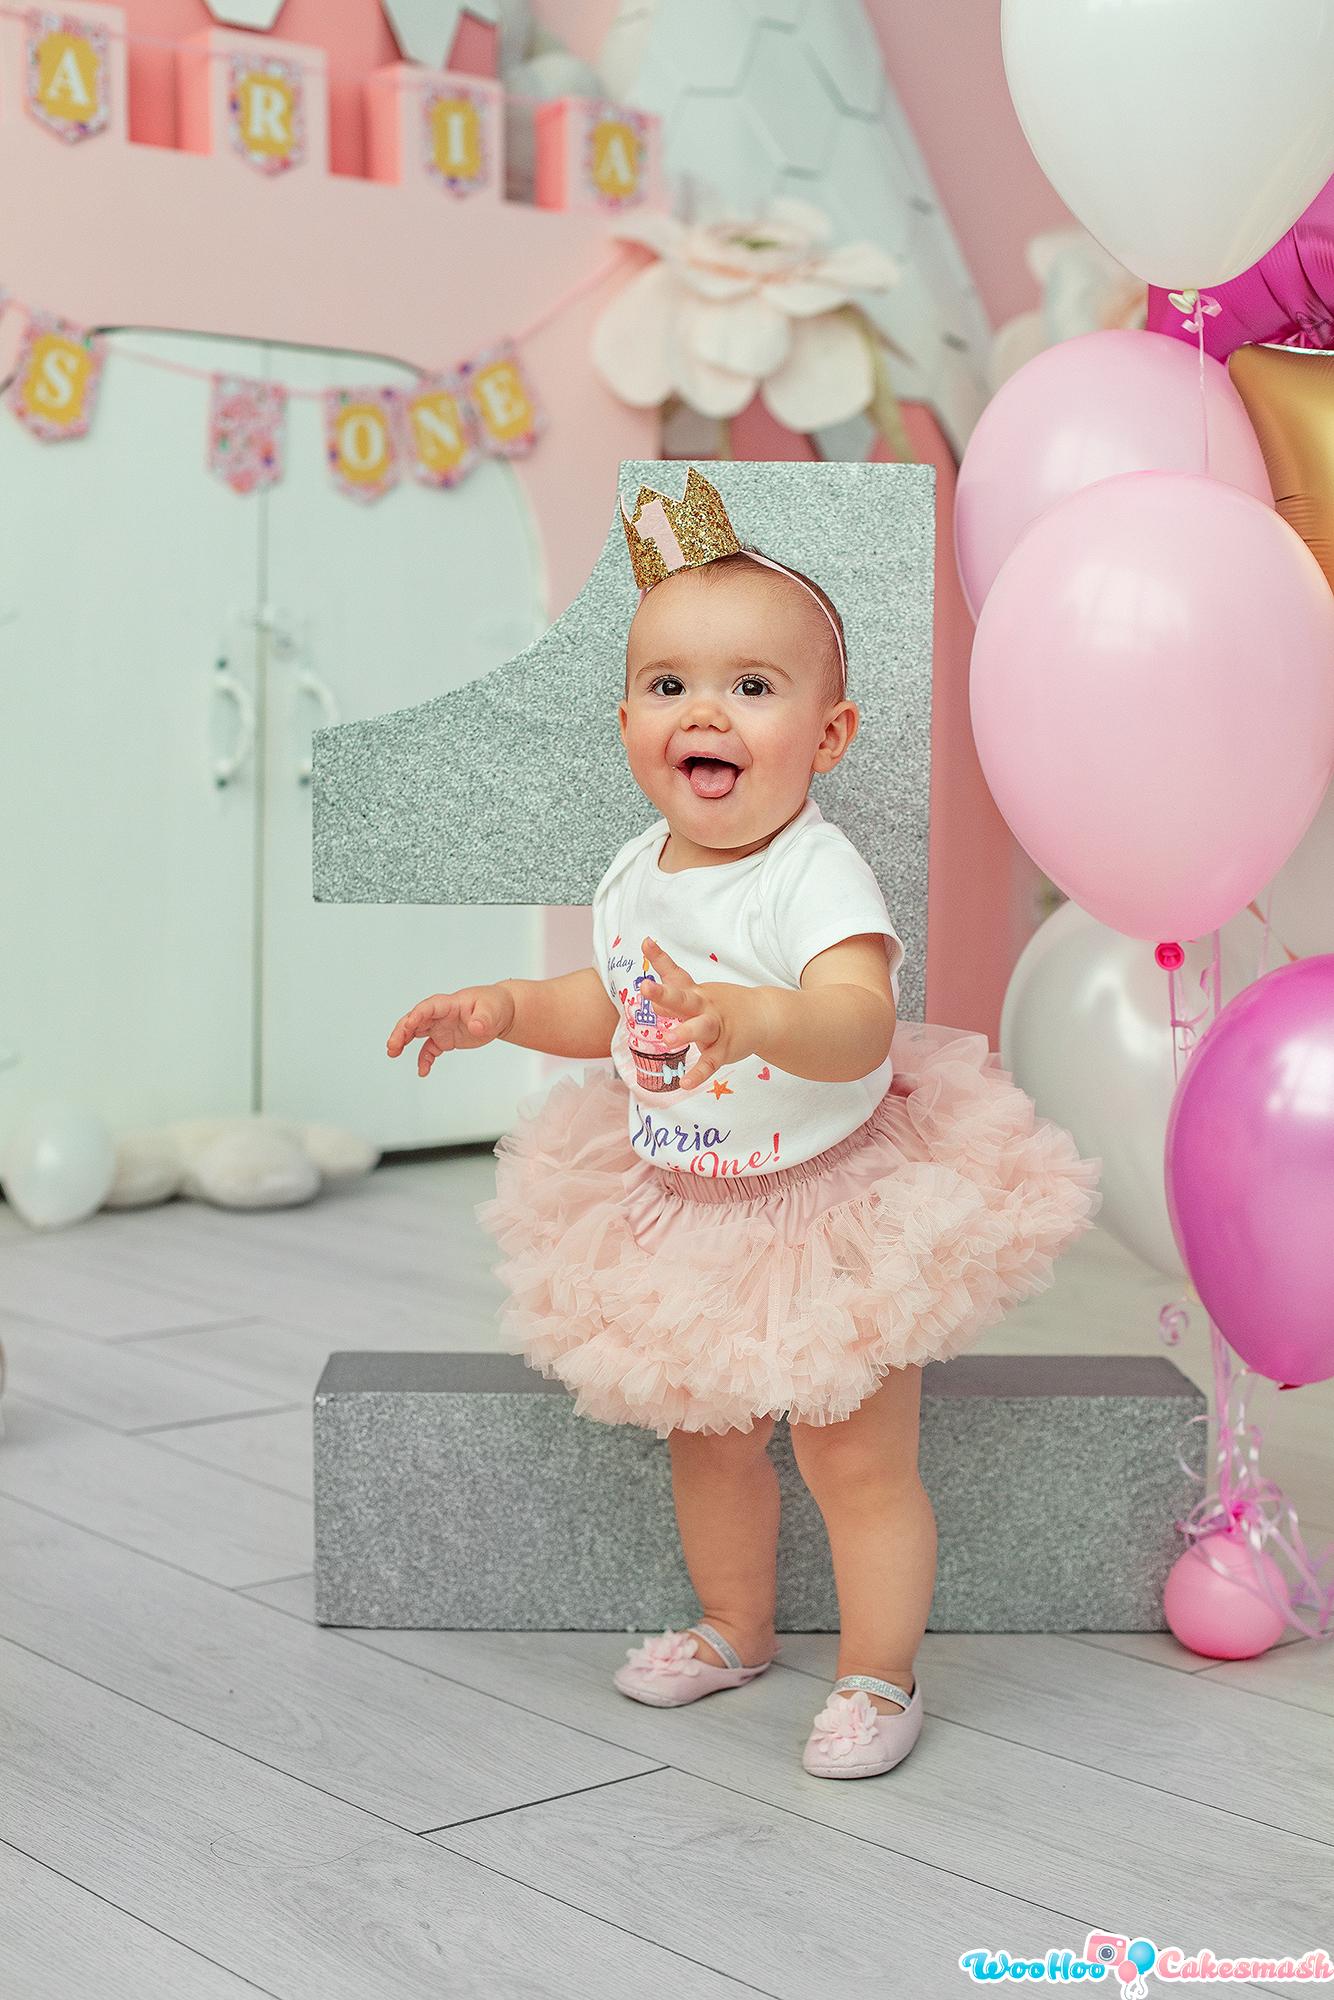 woohoo_cakesmash_MARIYA_the_princess_9